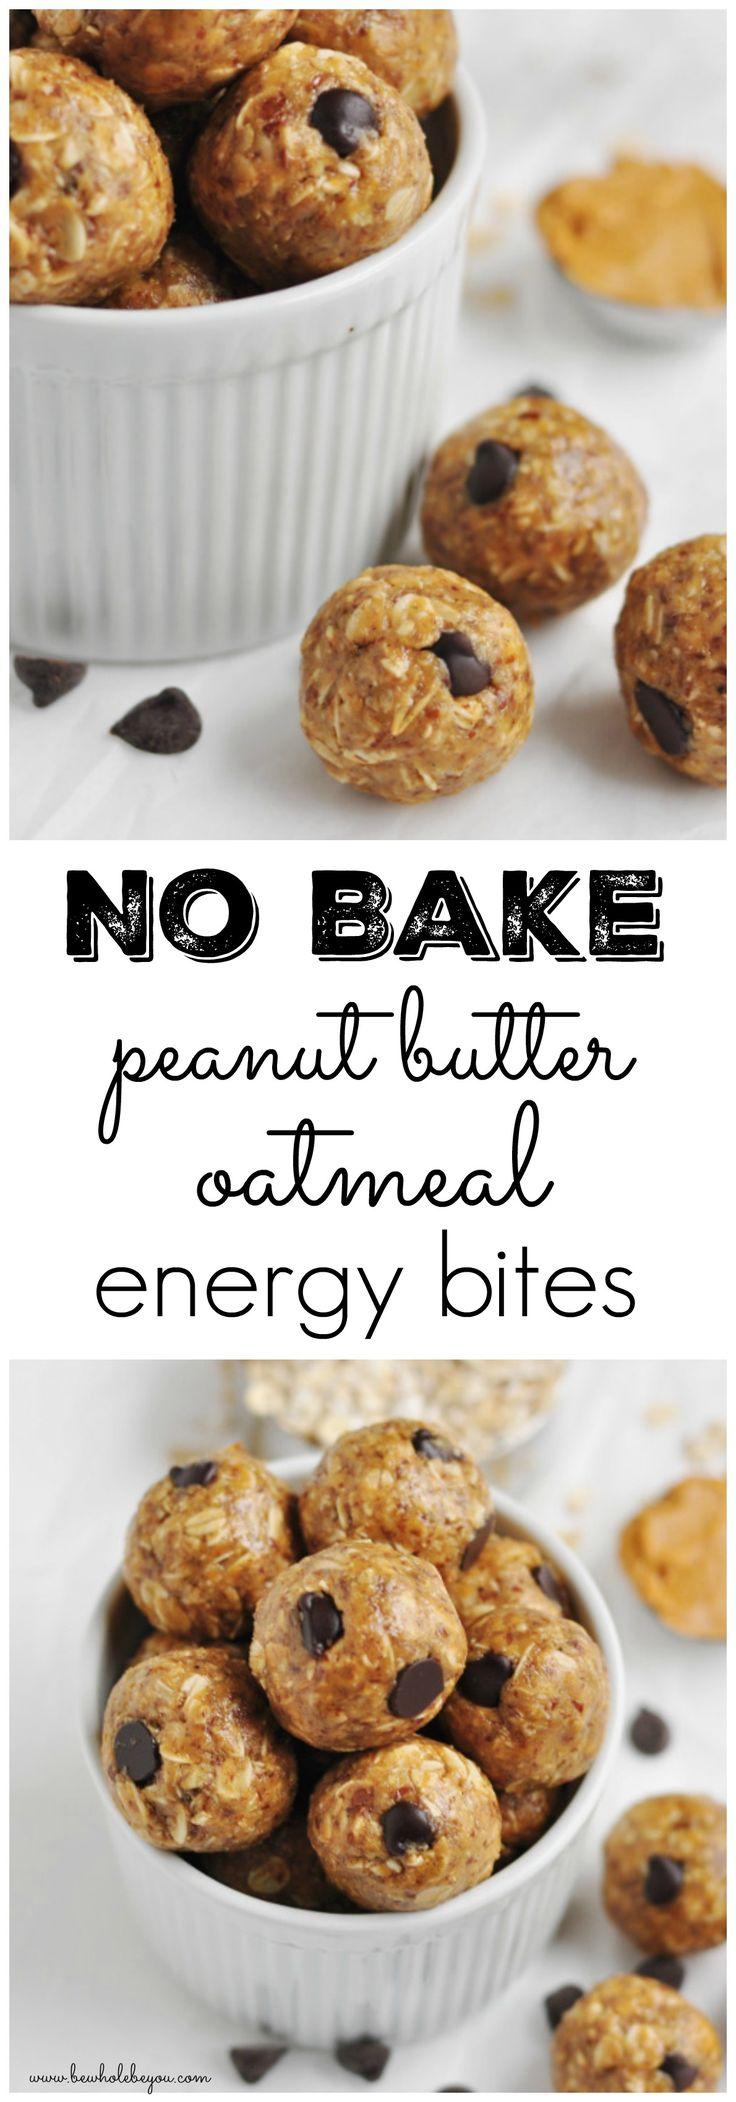 Na Bake Peanut Butter Oatmeal Energy Bites. Be Whole. Be You.